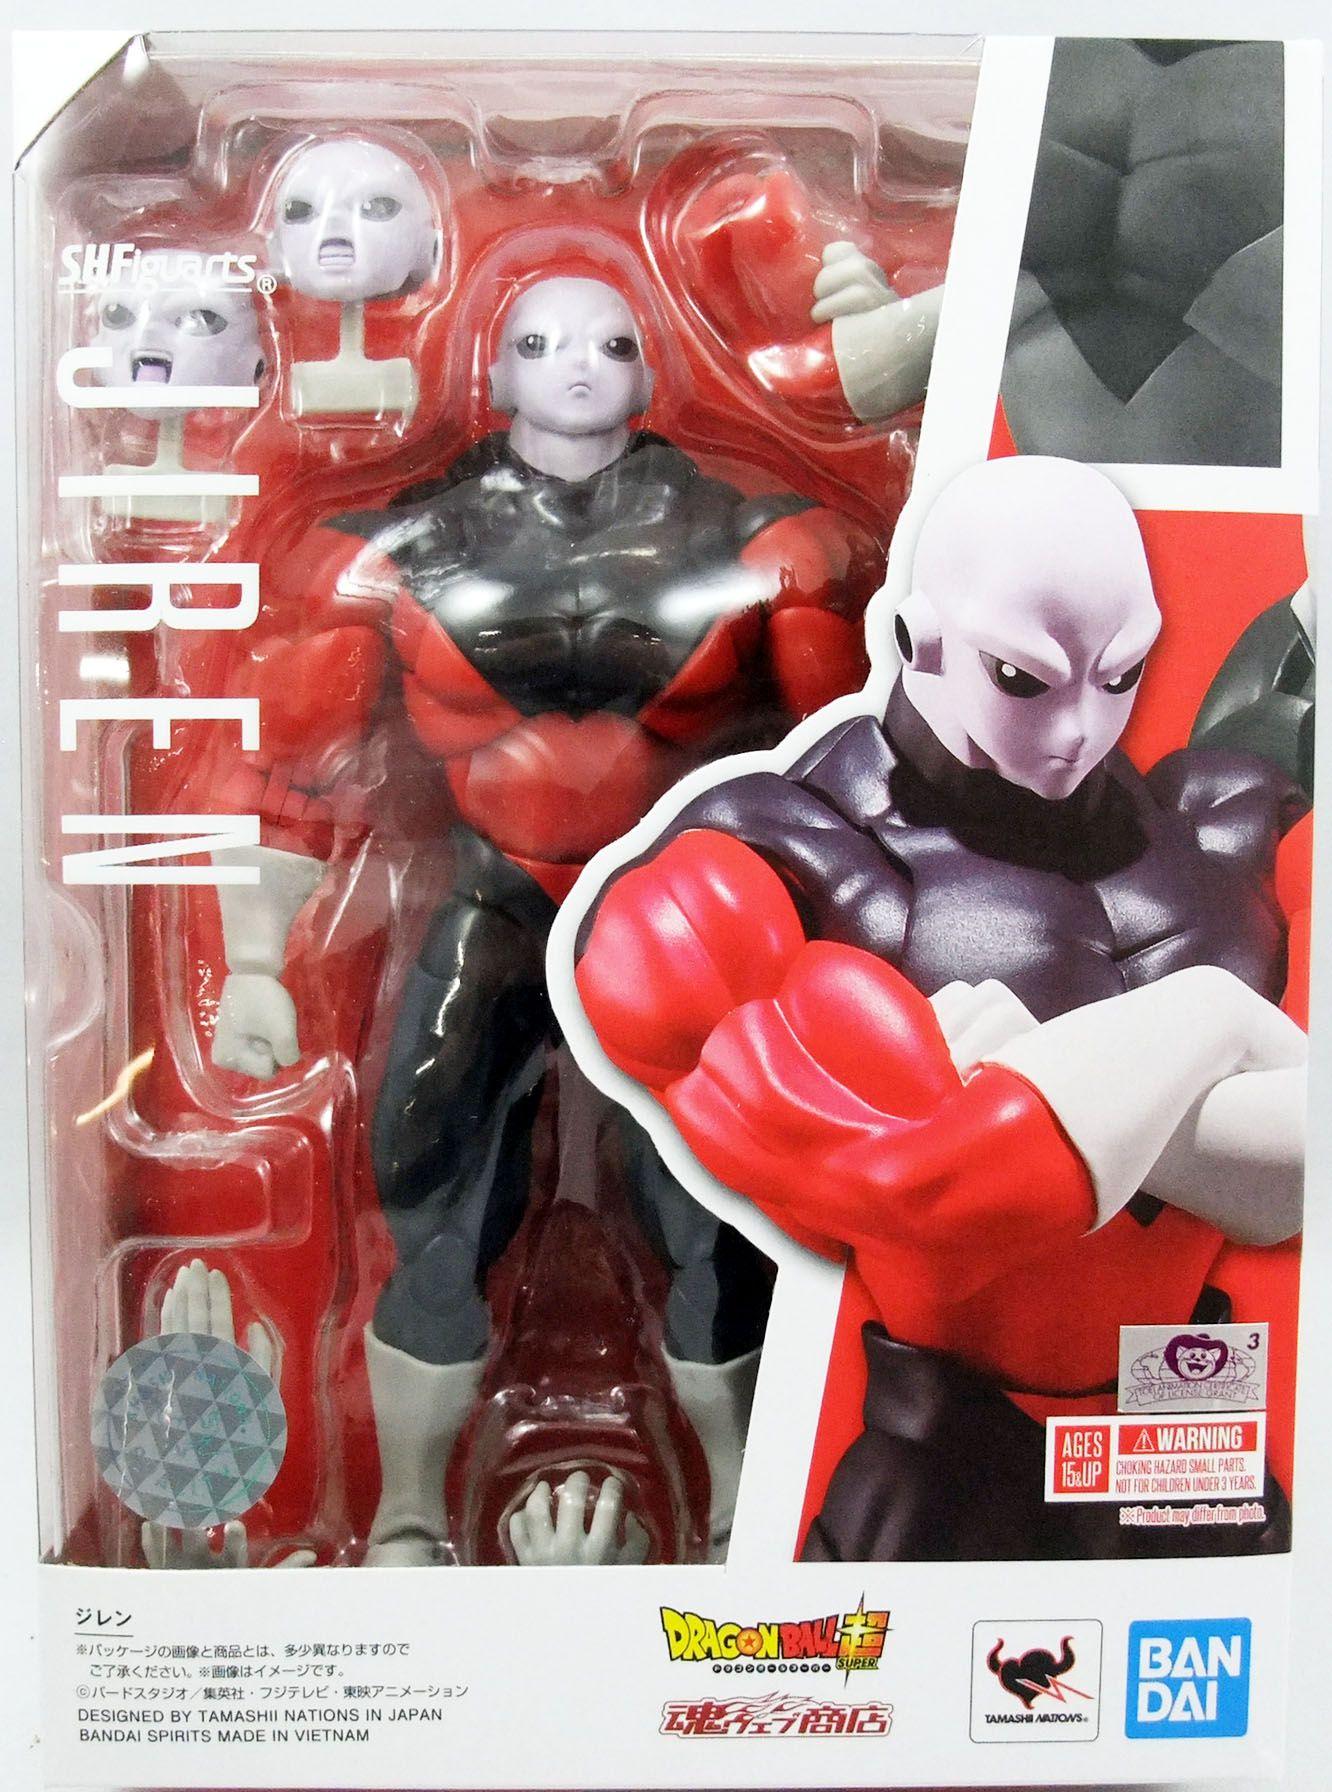 Dragonball Z - Bandai S.H.Figuarts - Jiren